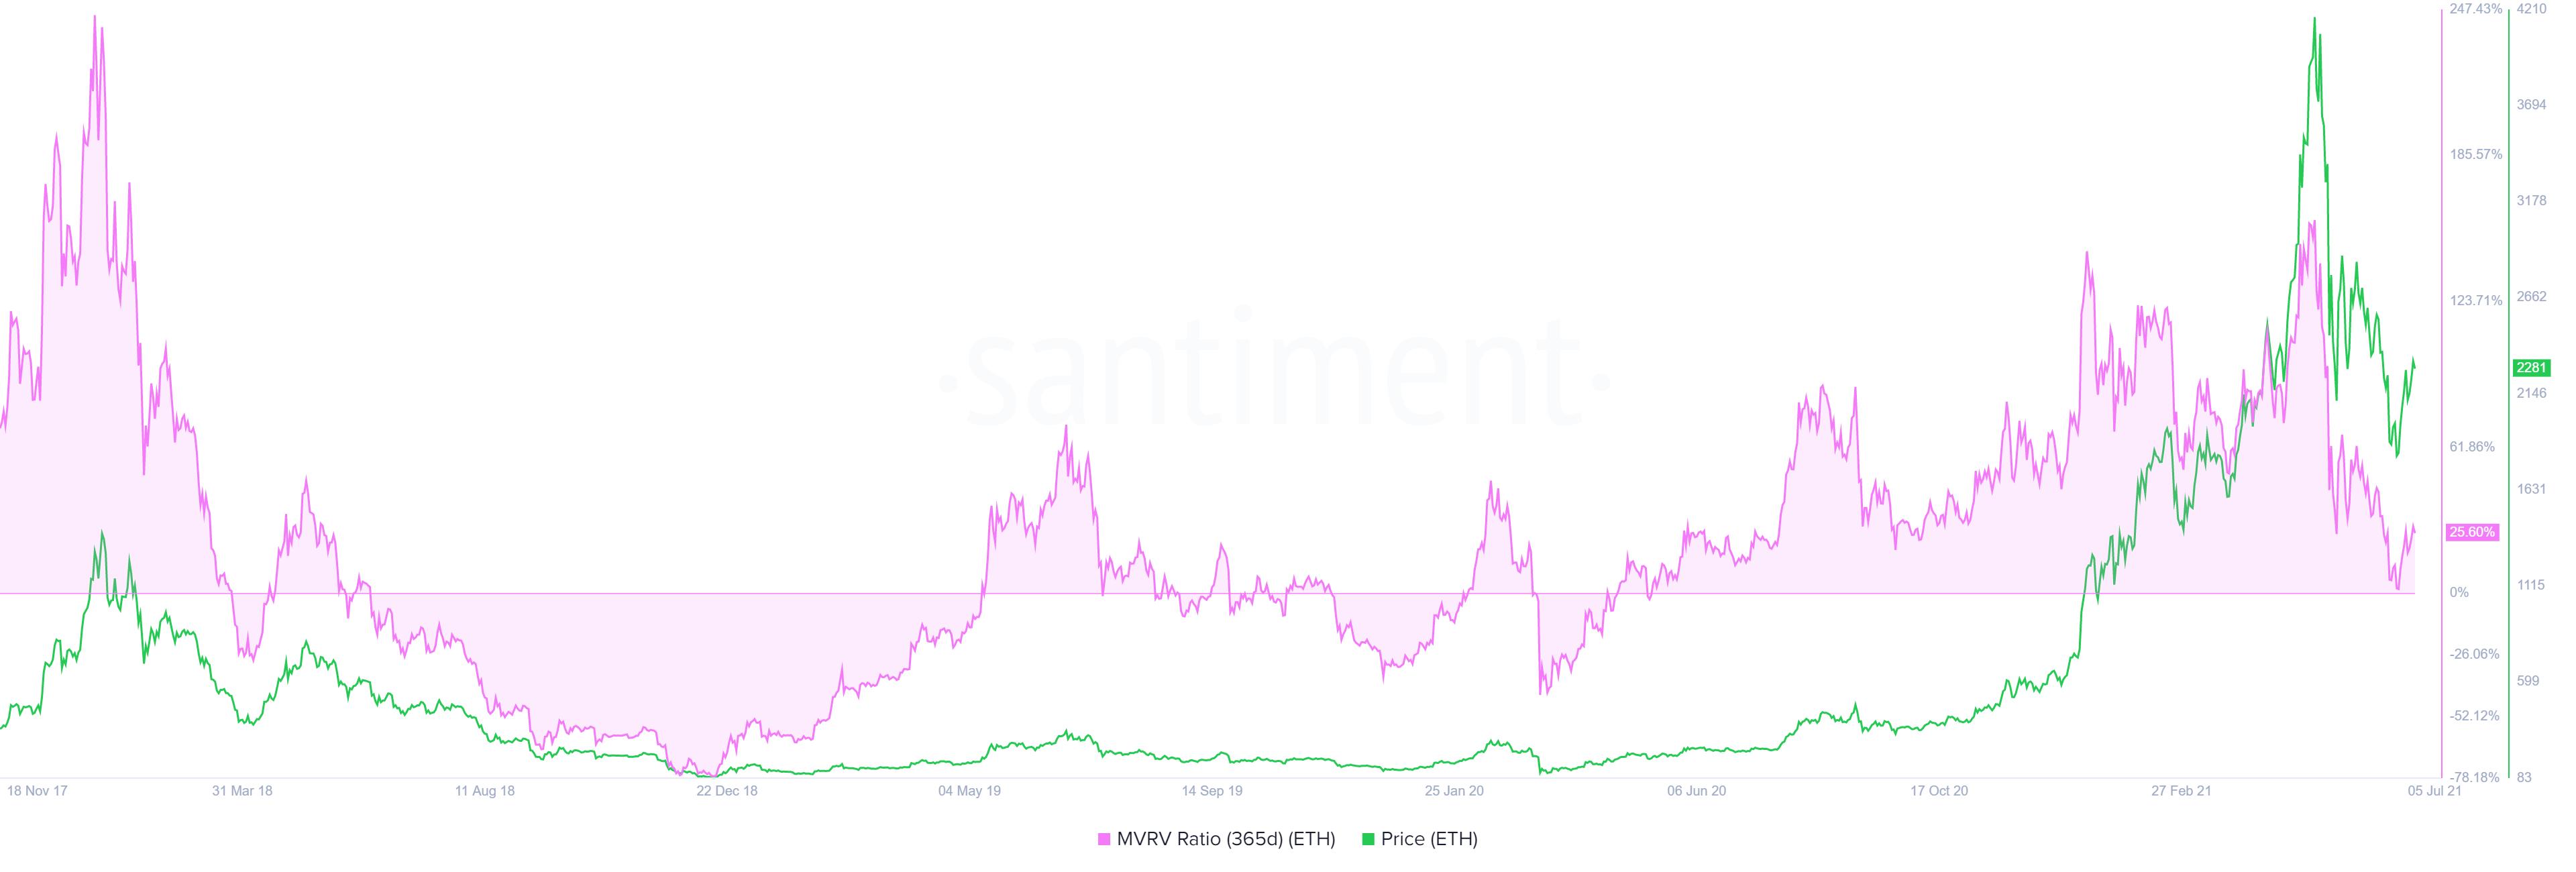 Ethereum 365-day MVRV chart